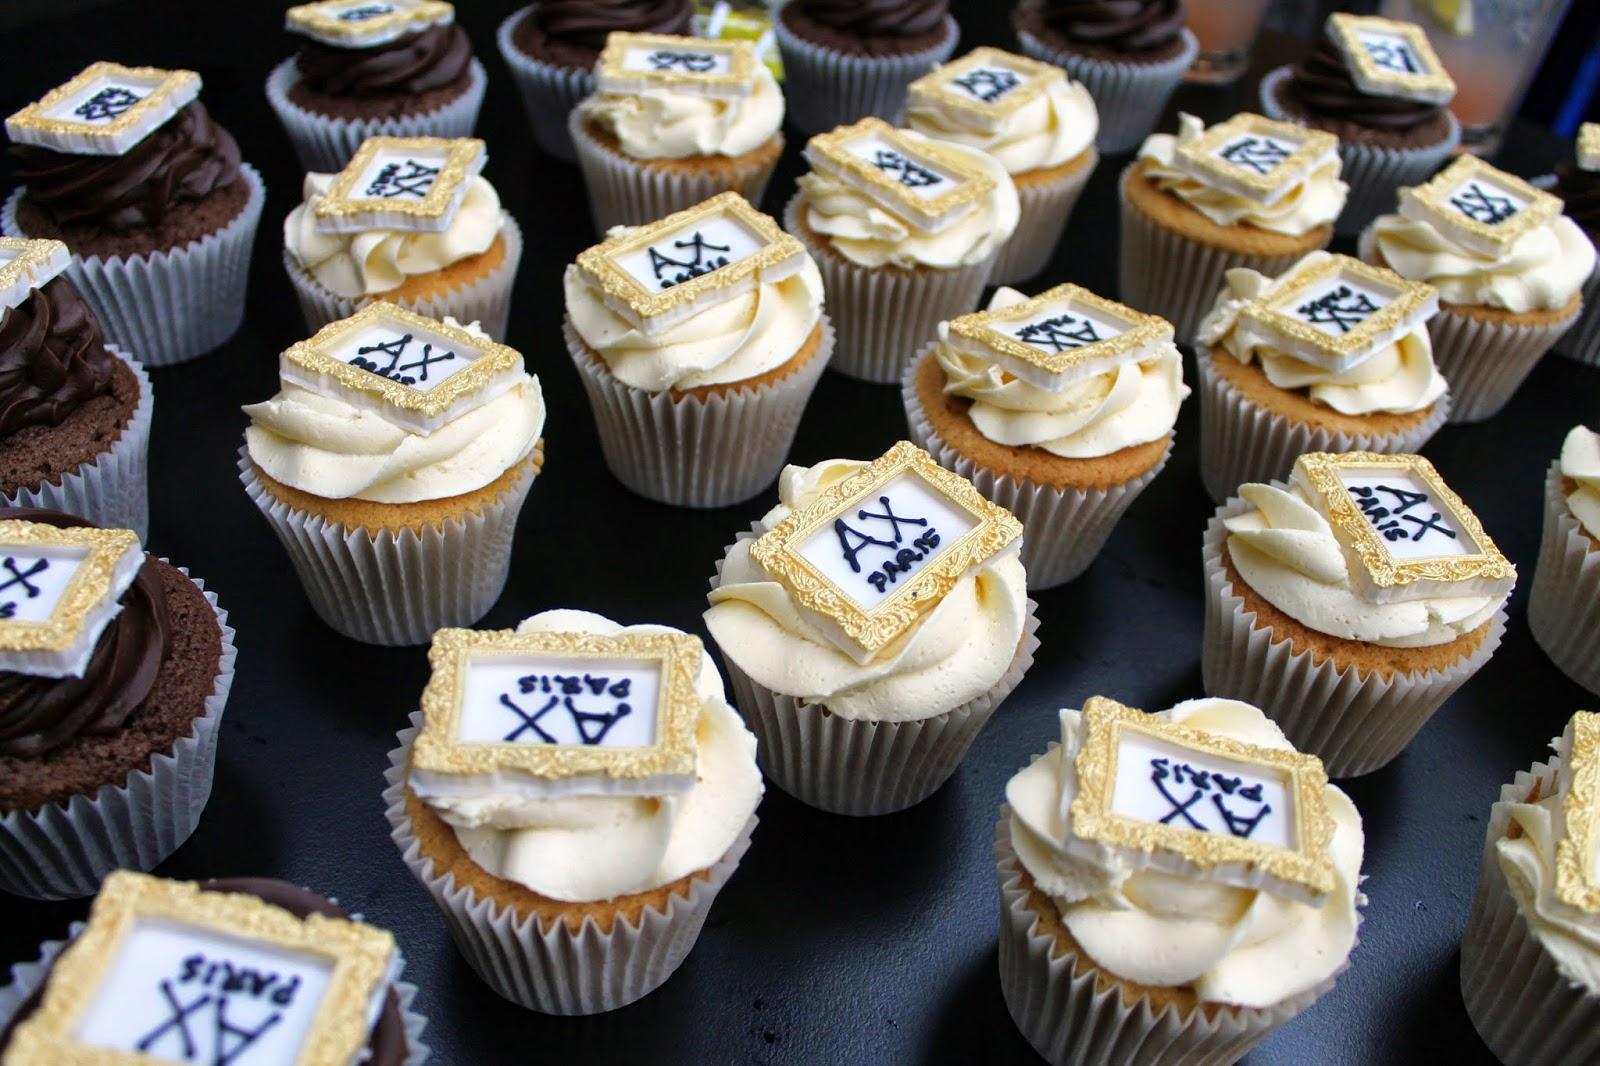 AX paris cupcakes